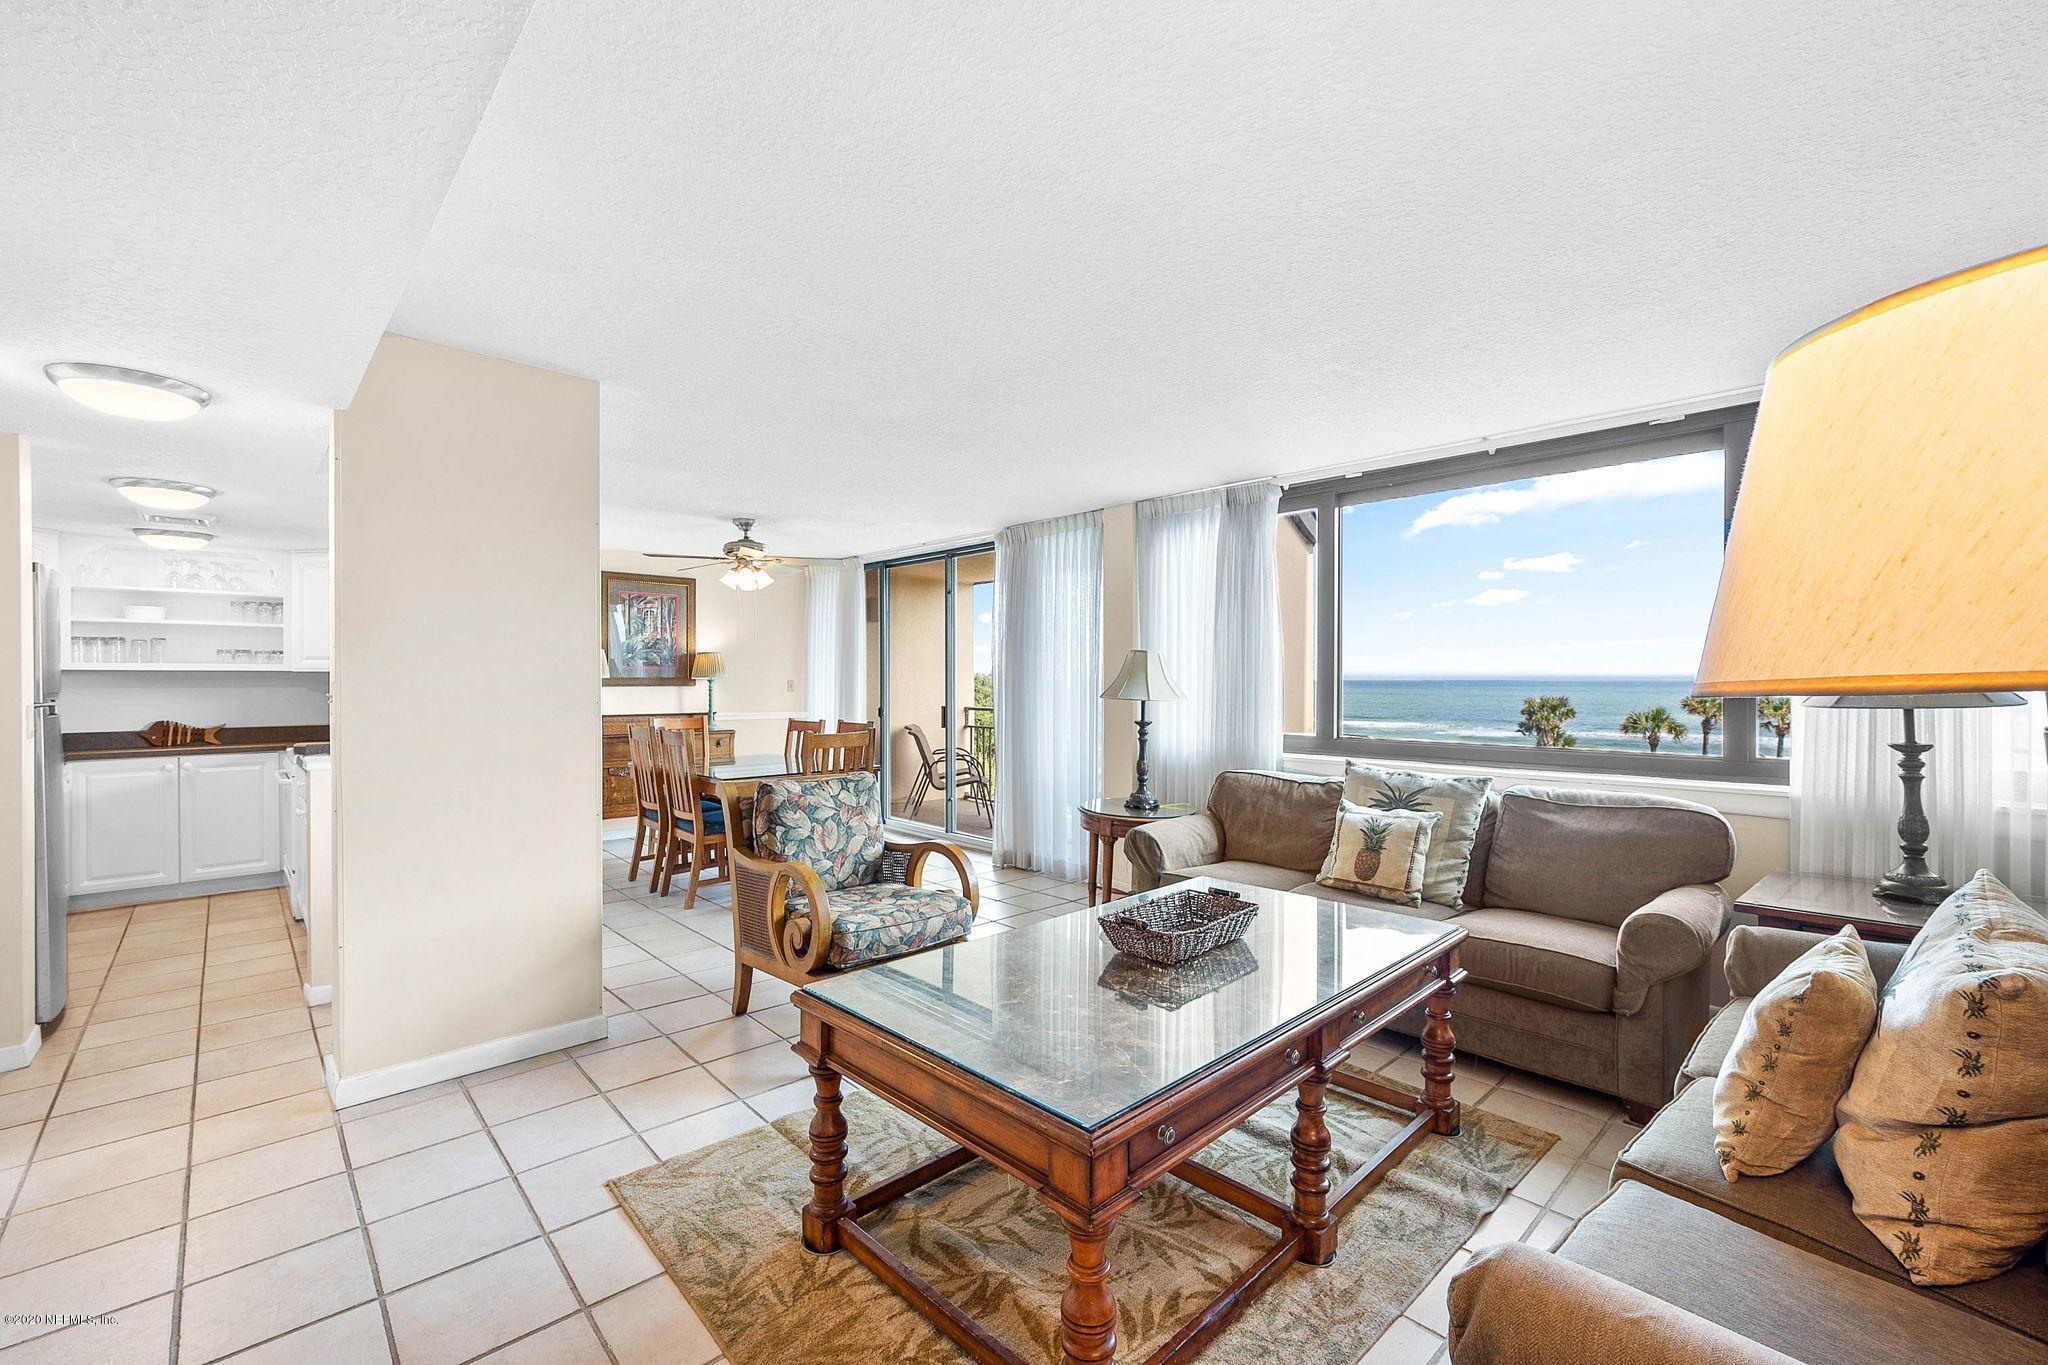 1168 BEACH WALKER, FERNANDINA BEACH, FLORIDA 32034, 3 Bedrooms Bedrooms, ,2 BathroomsBathrooms,Residential,For sale,BEACH WALKER,1080659